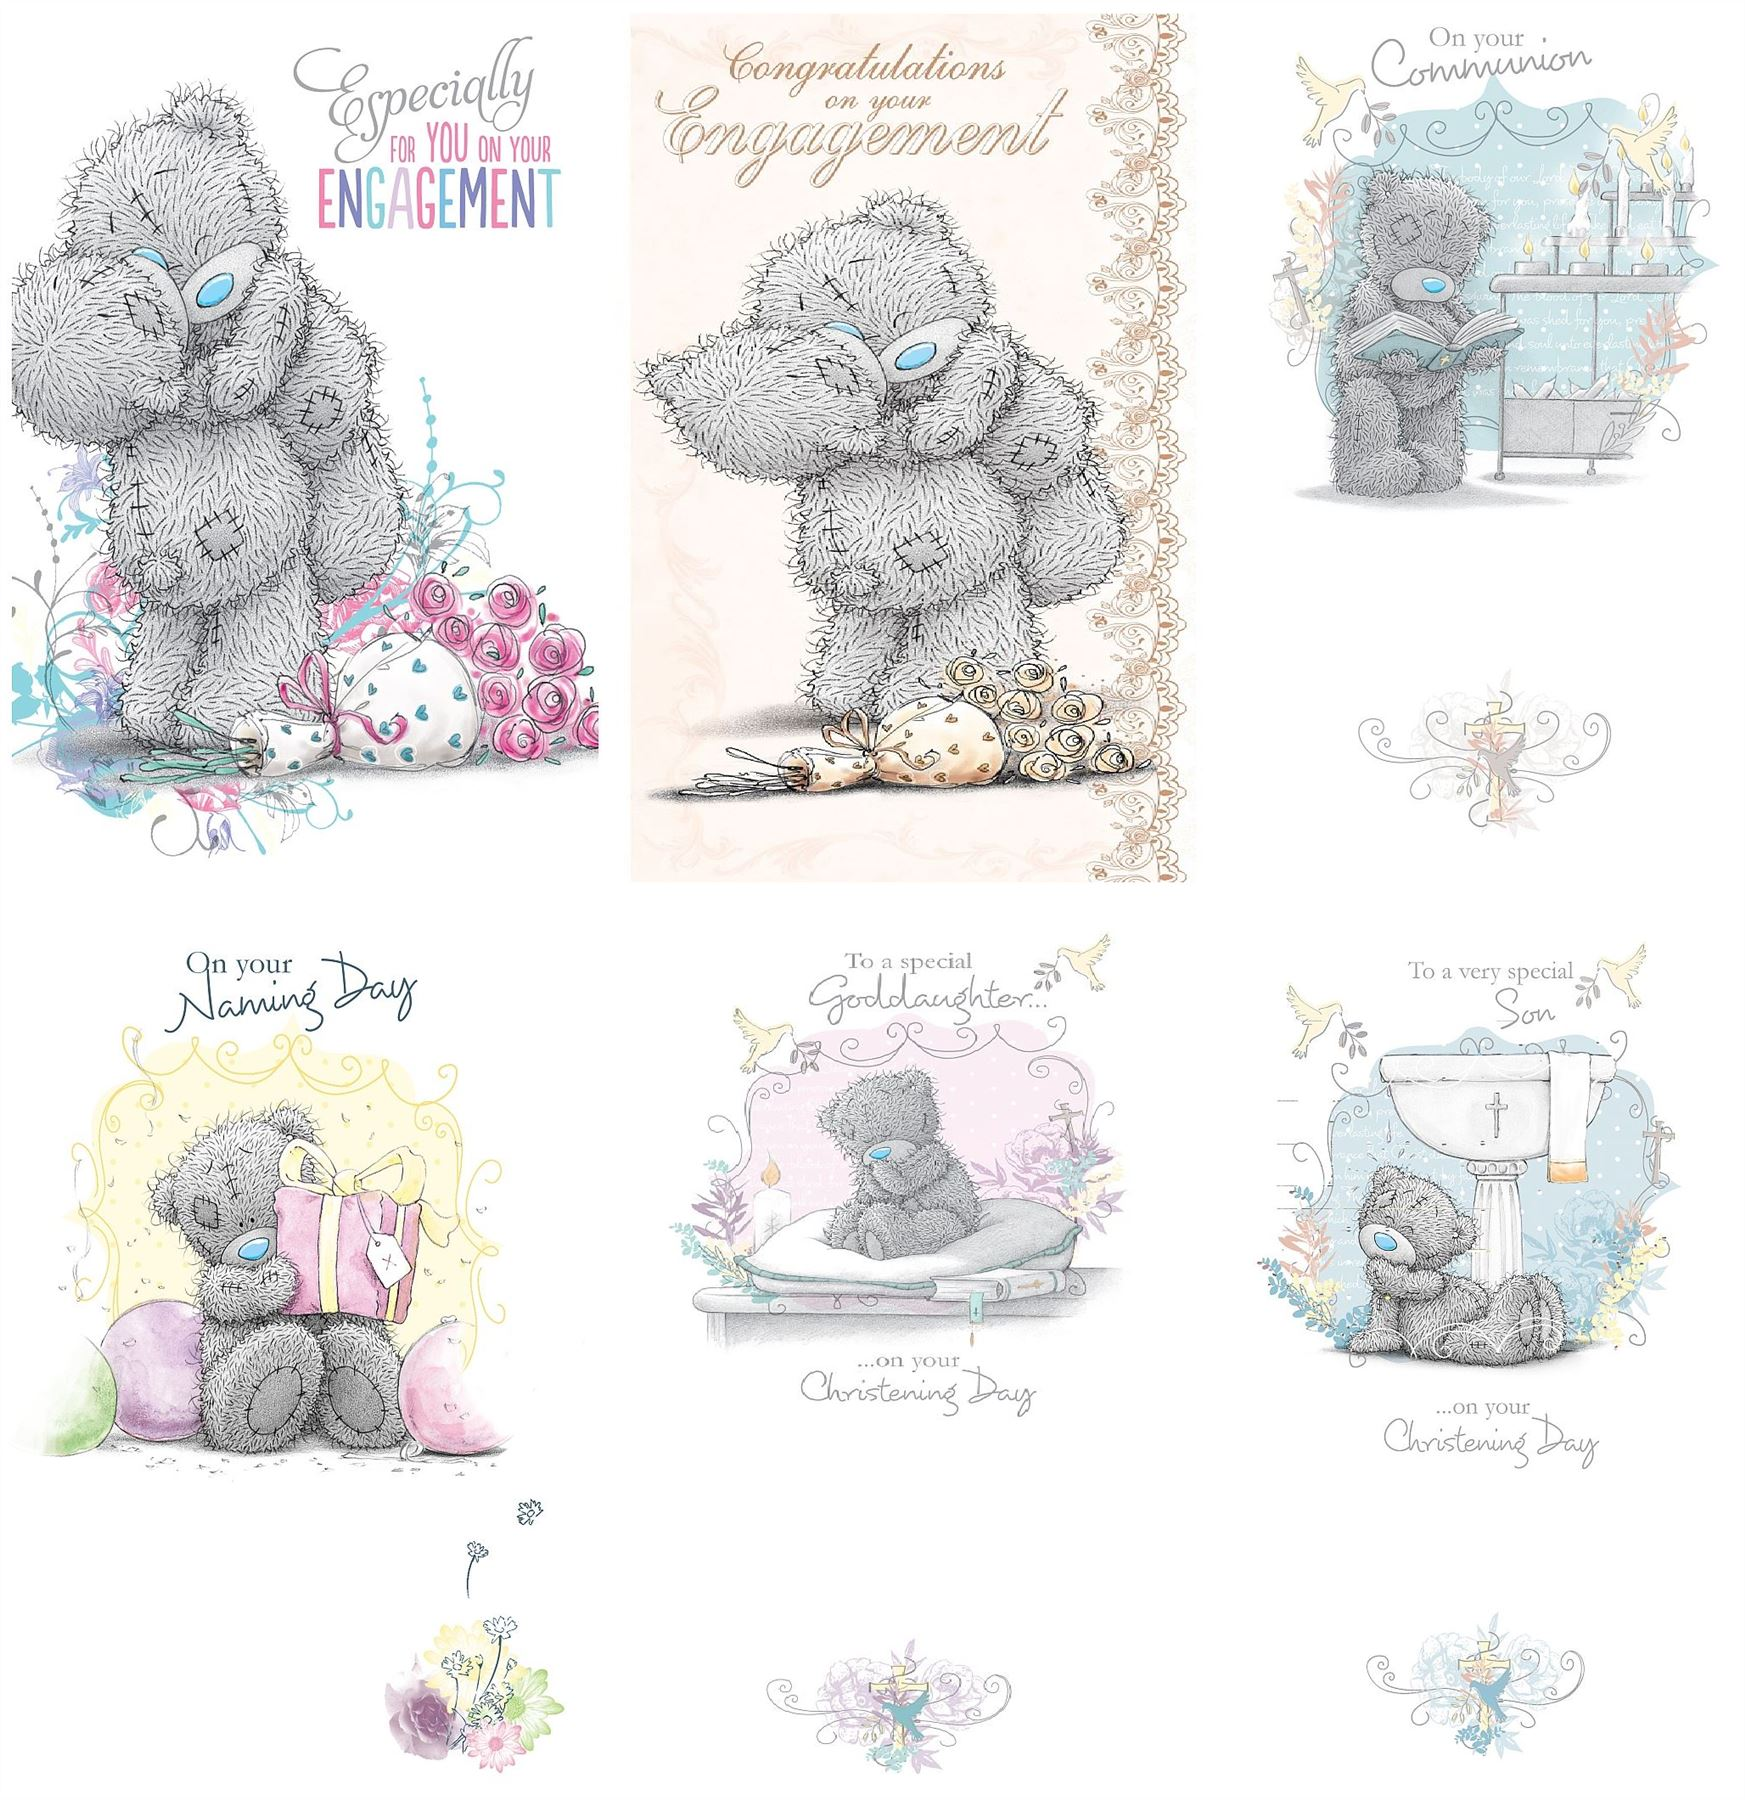 Outstanding Tatty Teddy Wedding Invitations Photos - Invitation Card ...